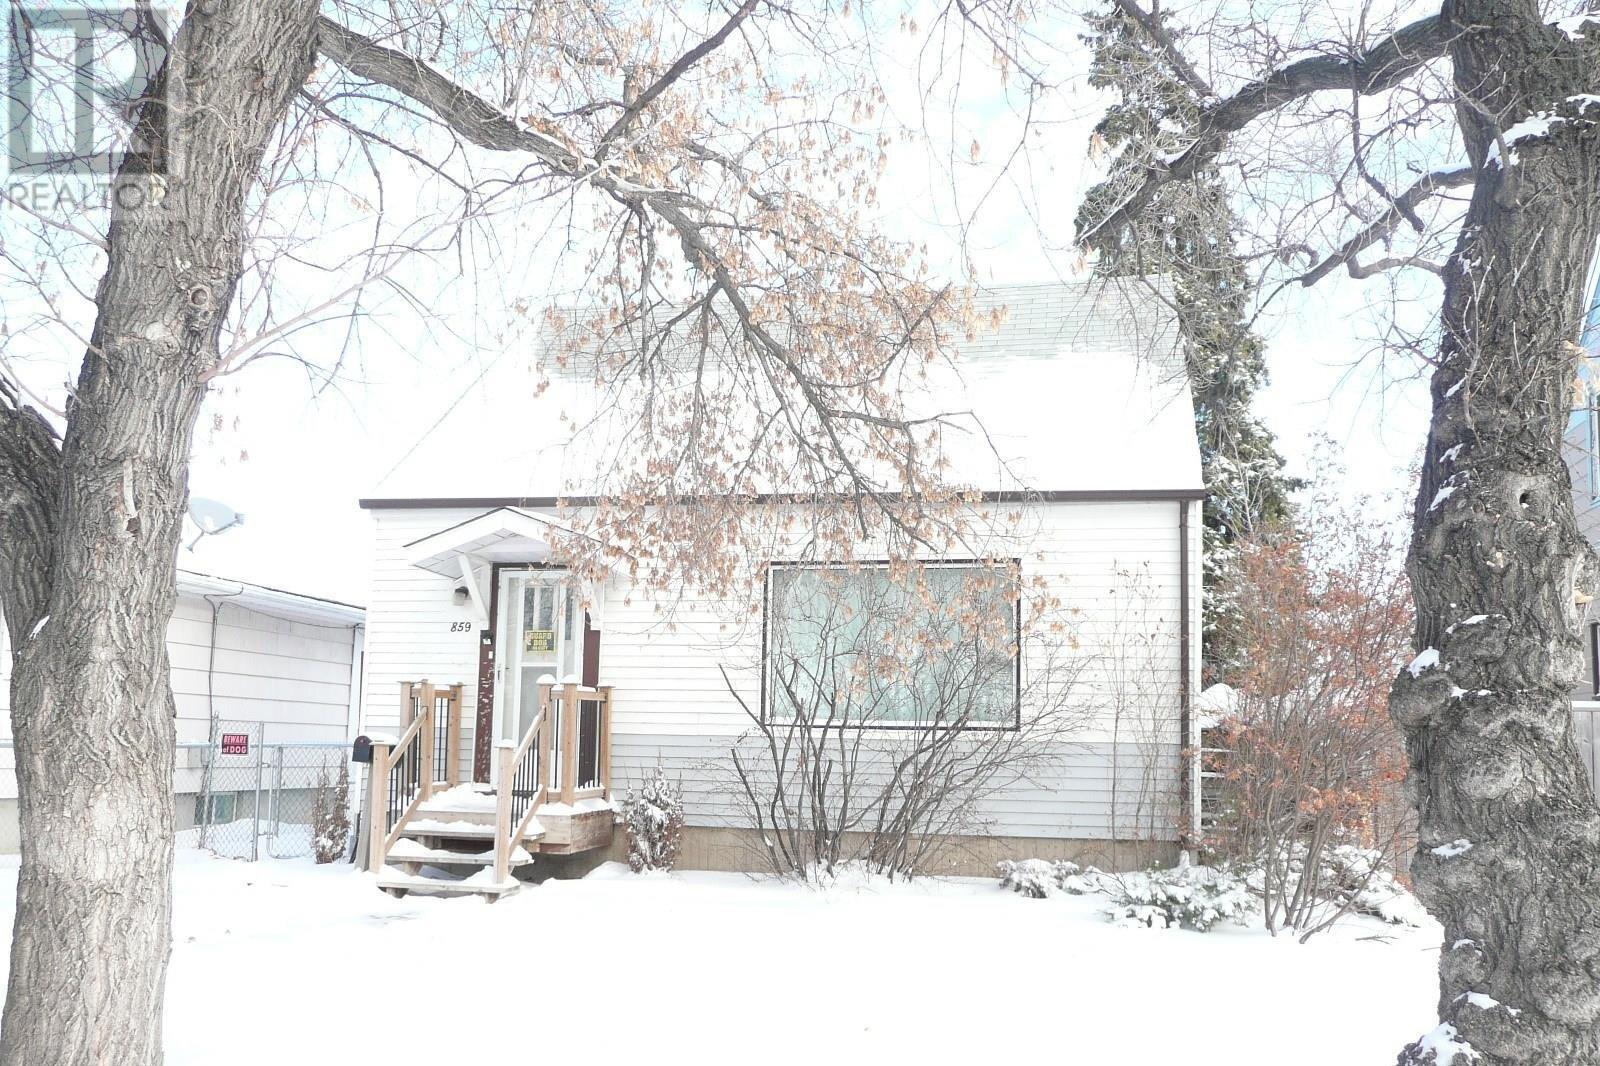 House for sale at 859 Pasqua St Regina Saskatchewan - MLS: SK833466